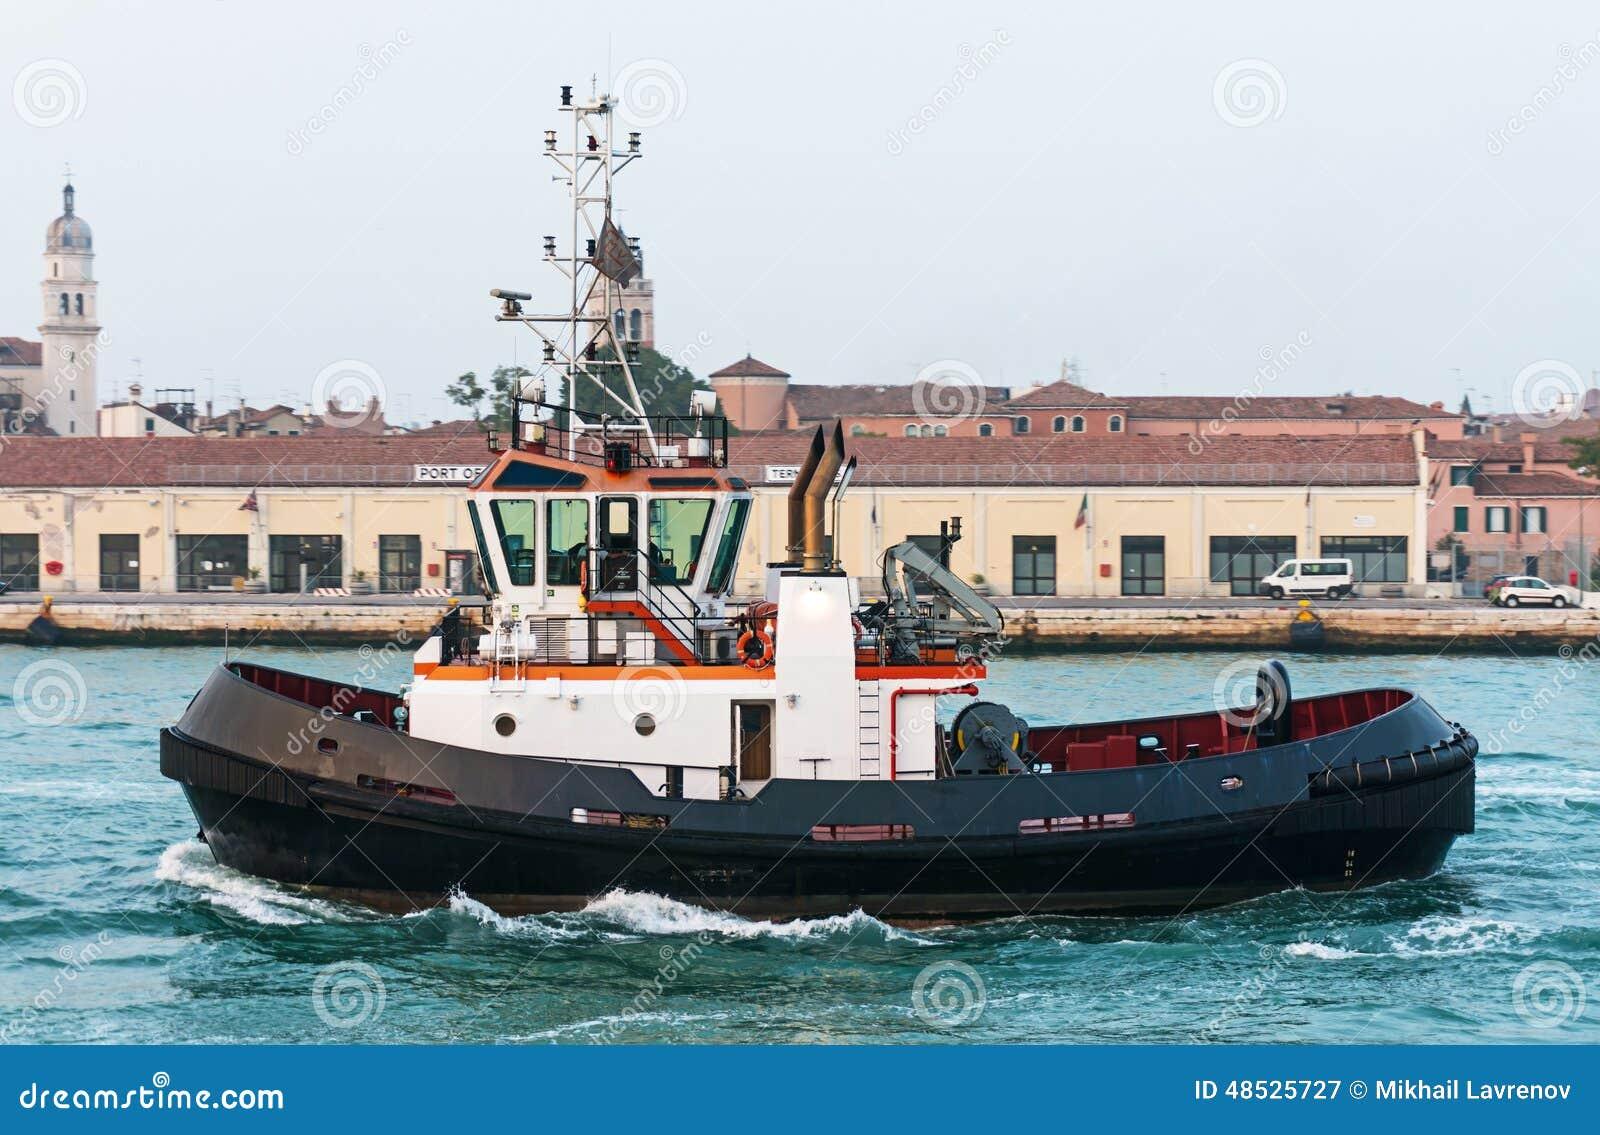 Tug boat in front of the old port in Venice